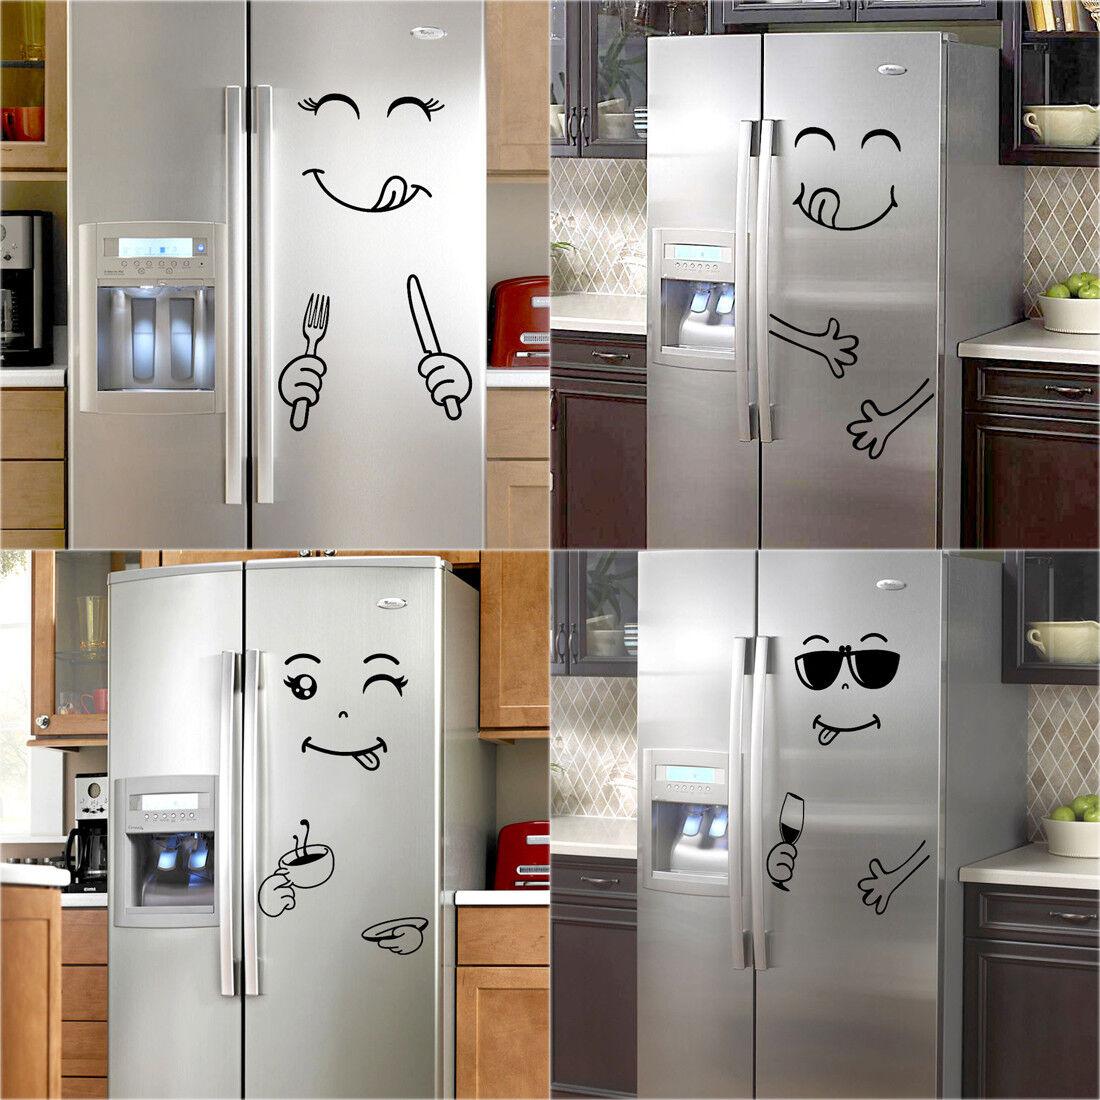 Home Decoration - Cute Sticker Fridge Happy Delicious Face Kitchen Fridge Wall Stickers Home Decor